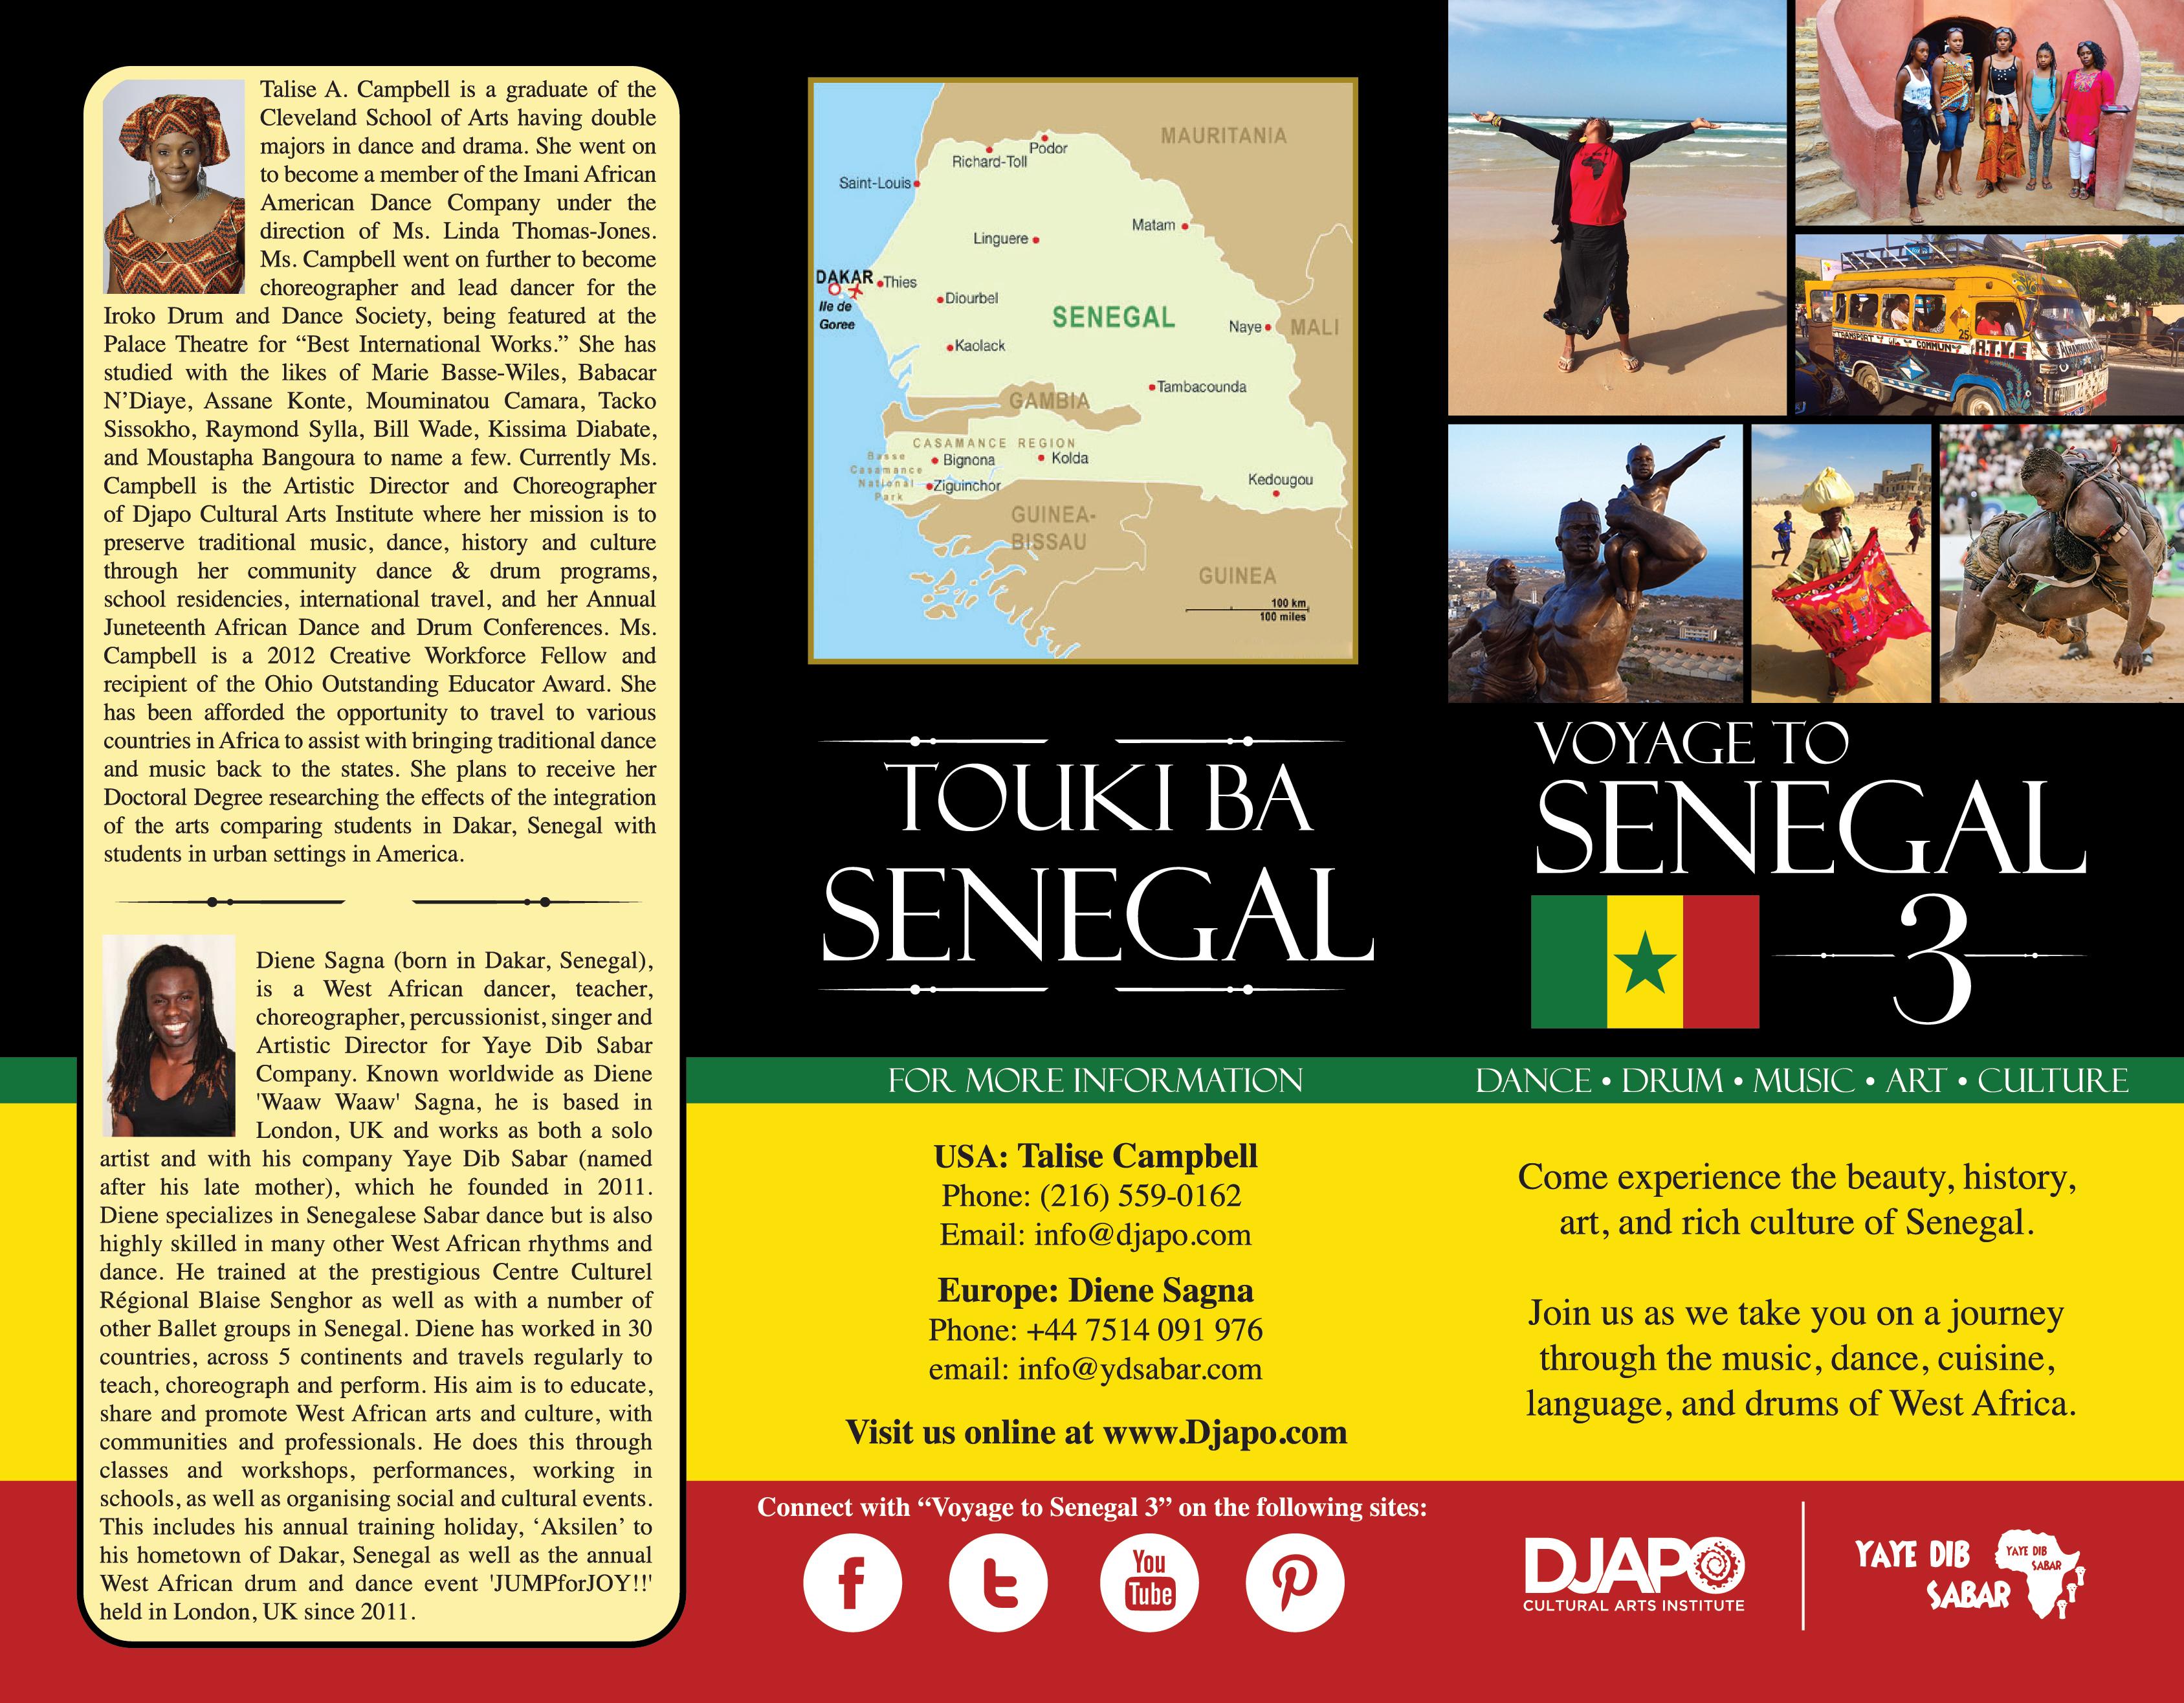 Djapo 2016 Senegal